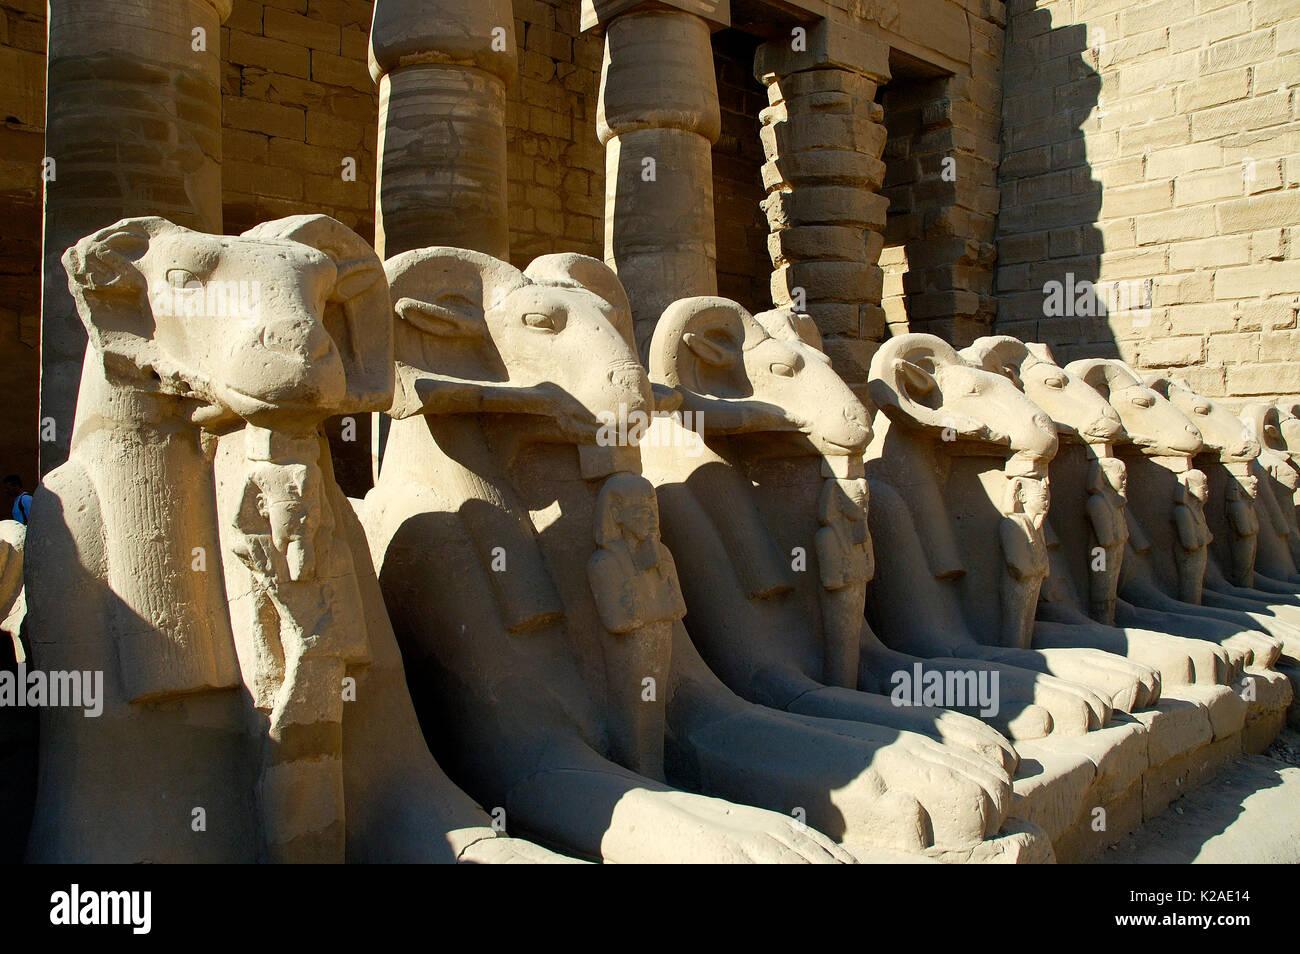 Khnum from the Temple of Karnak, Luxor. Egypt - Stock Image